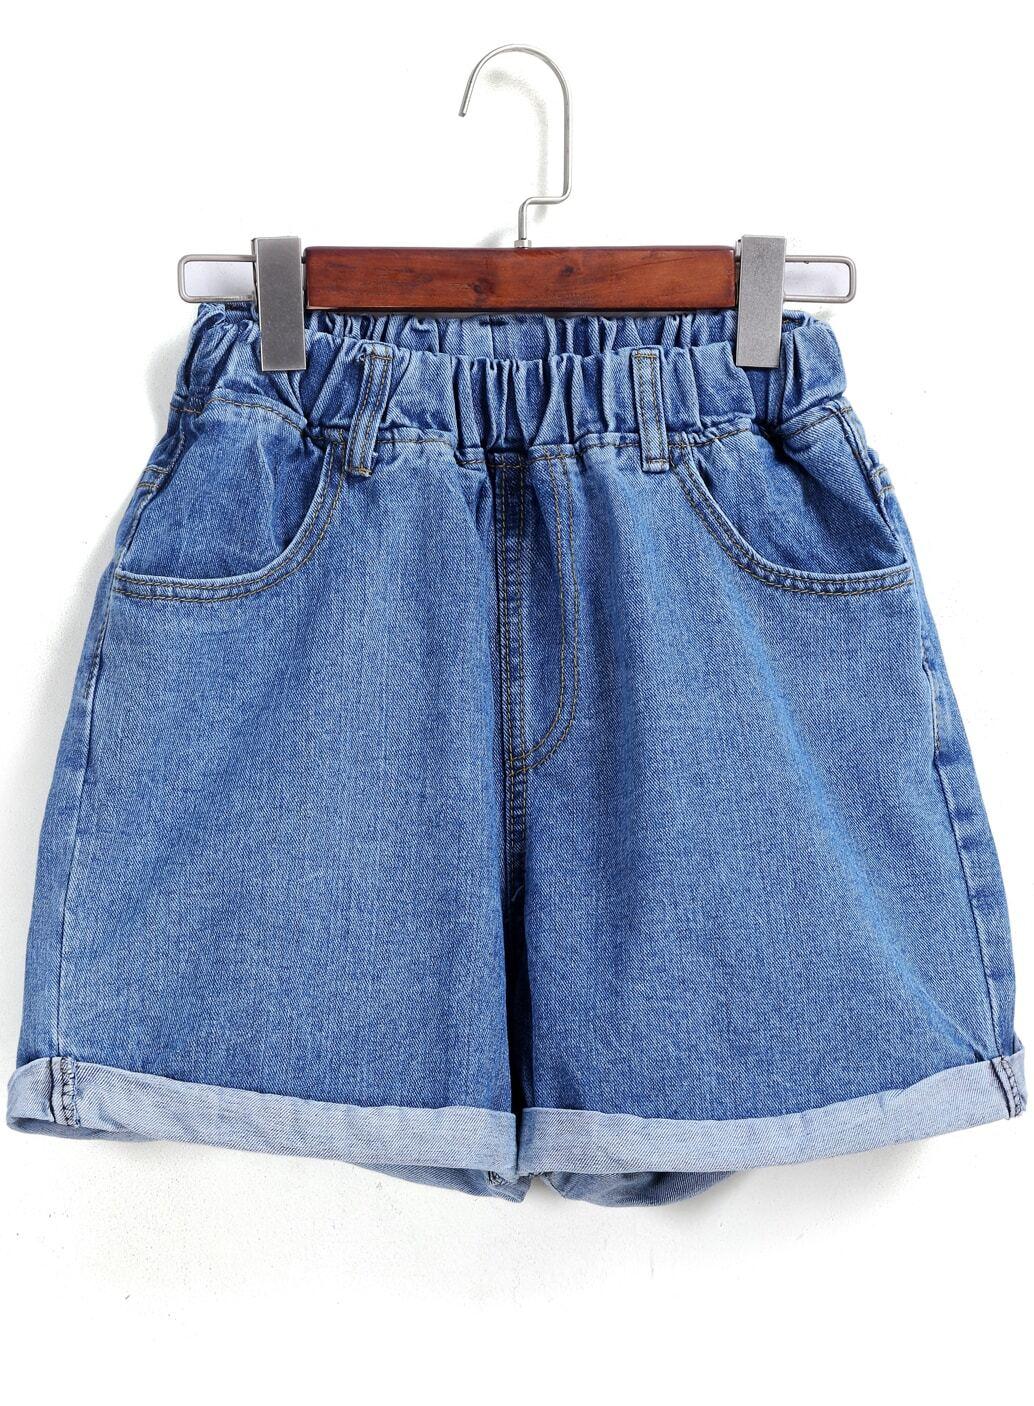 Blue Elastic Waist Flange Denim Shorts -SheIn(Sheinside) - photo#35